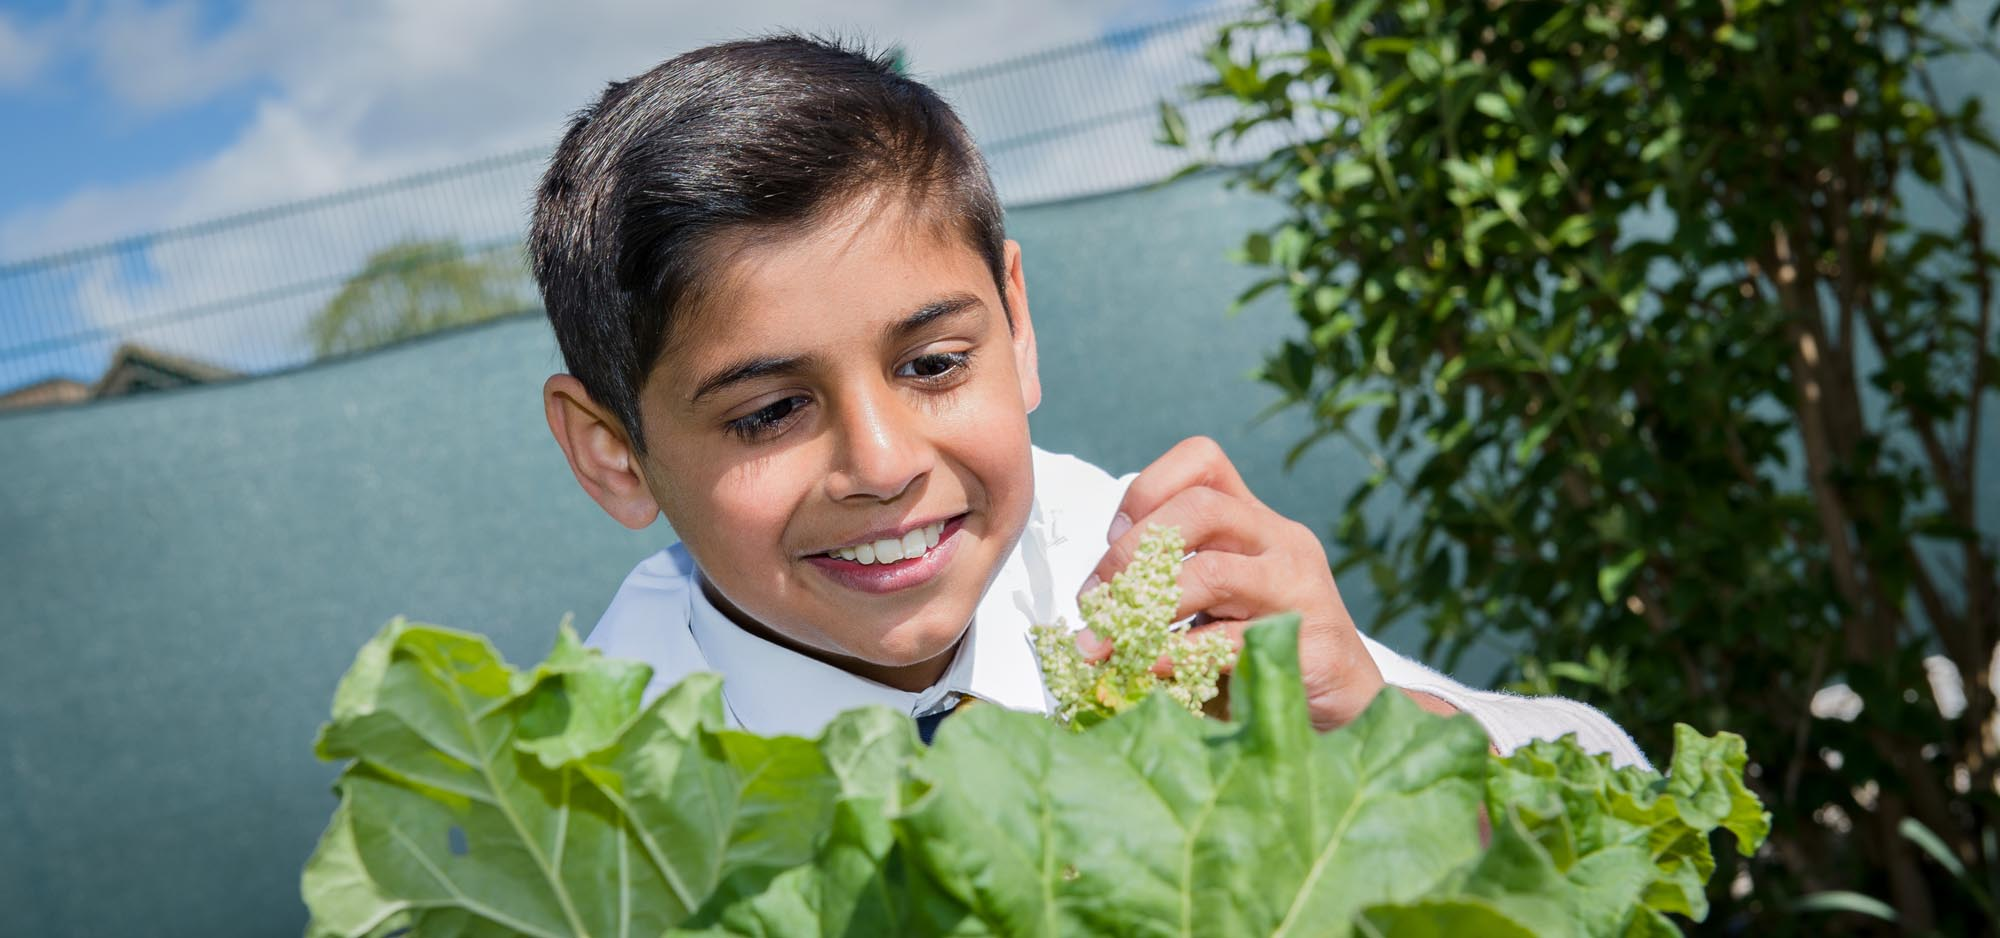 boy-gardening-leaves